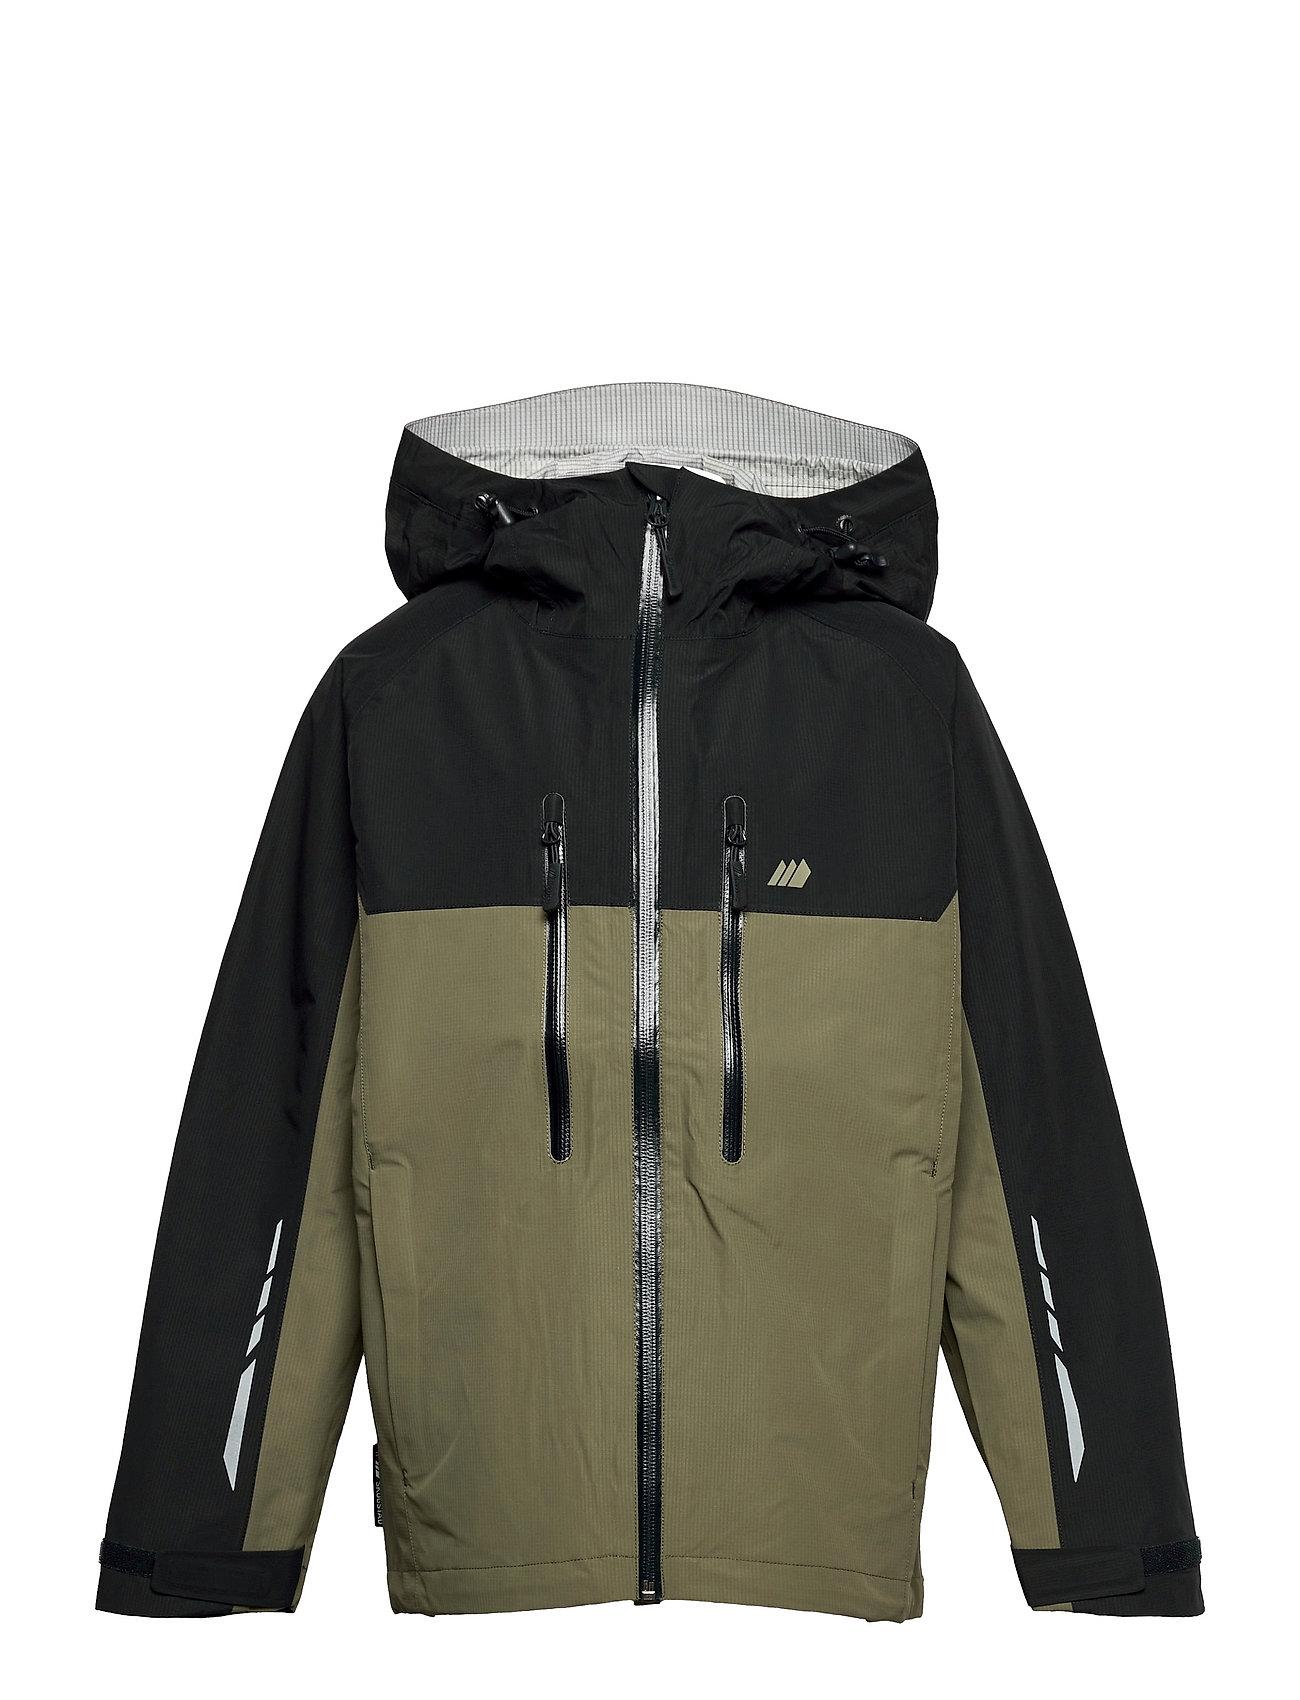 Skarfjellet 2,5-Layer Technical Shell Jacket Outerwear Shell Clothing Shell Jacket Grøn Skogstad